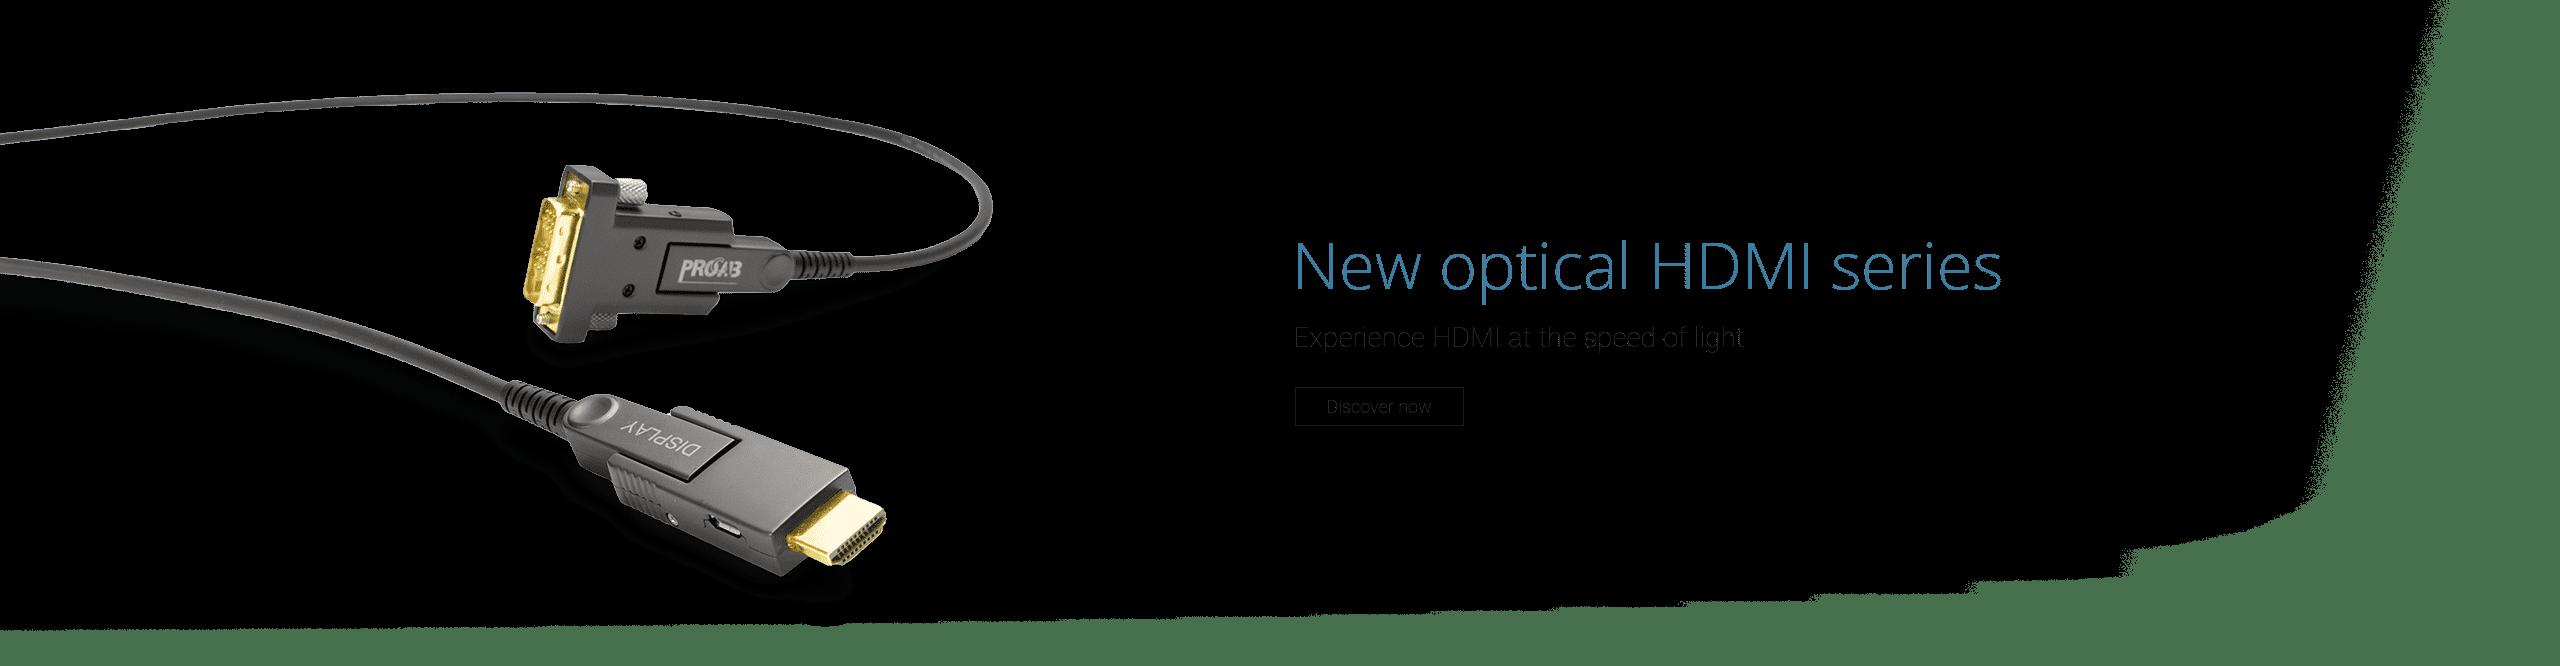 PROCAB - Optical HDMI series